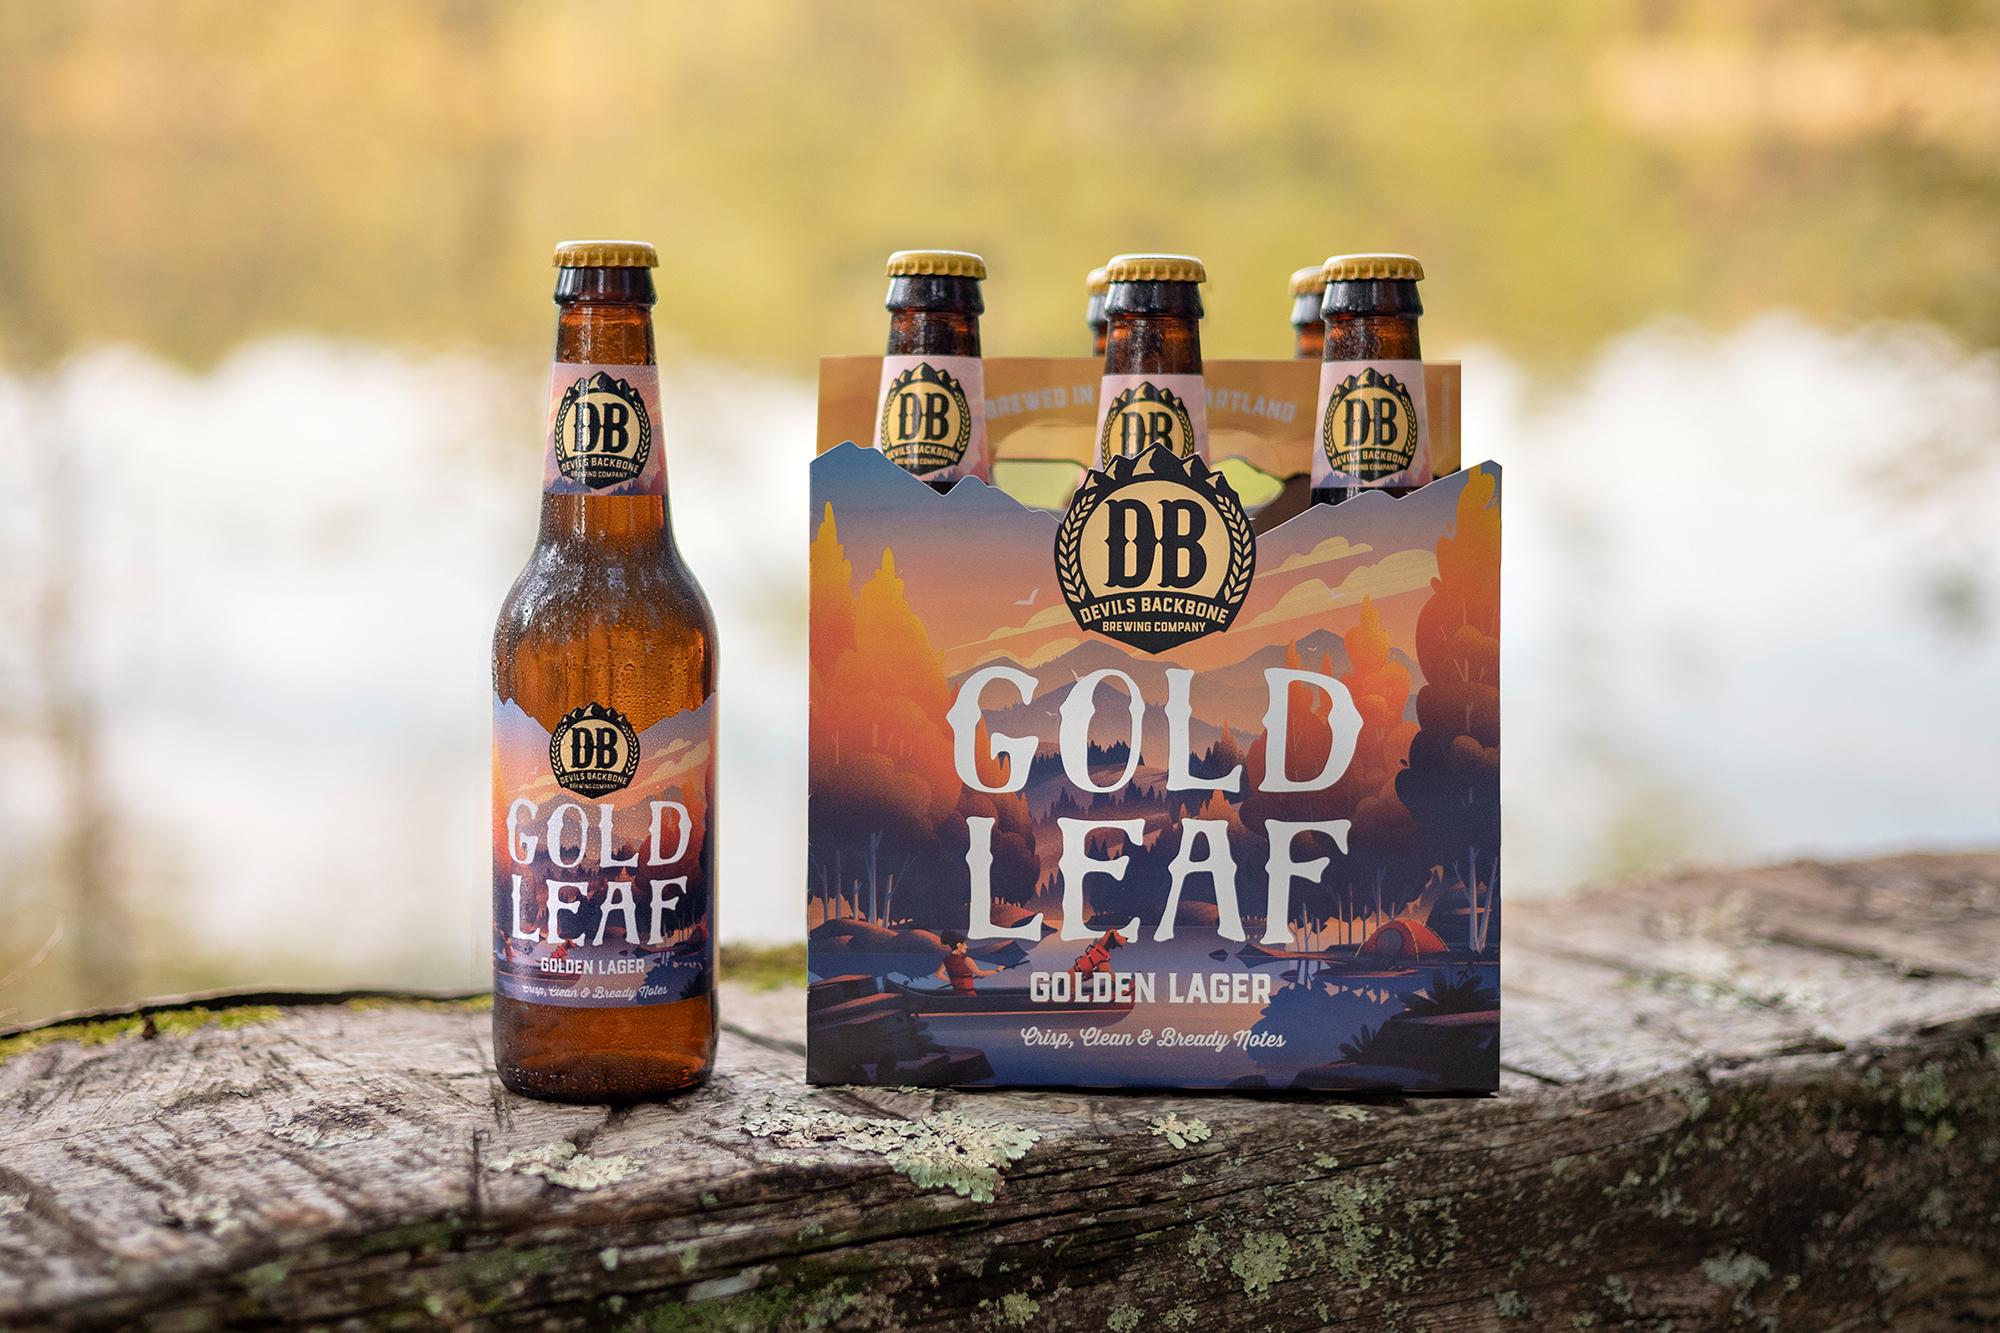 Beer & Branding: Devils Backbone Rebrand